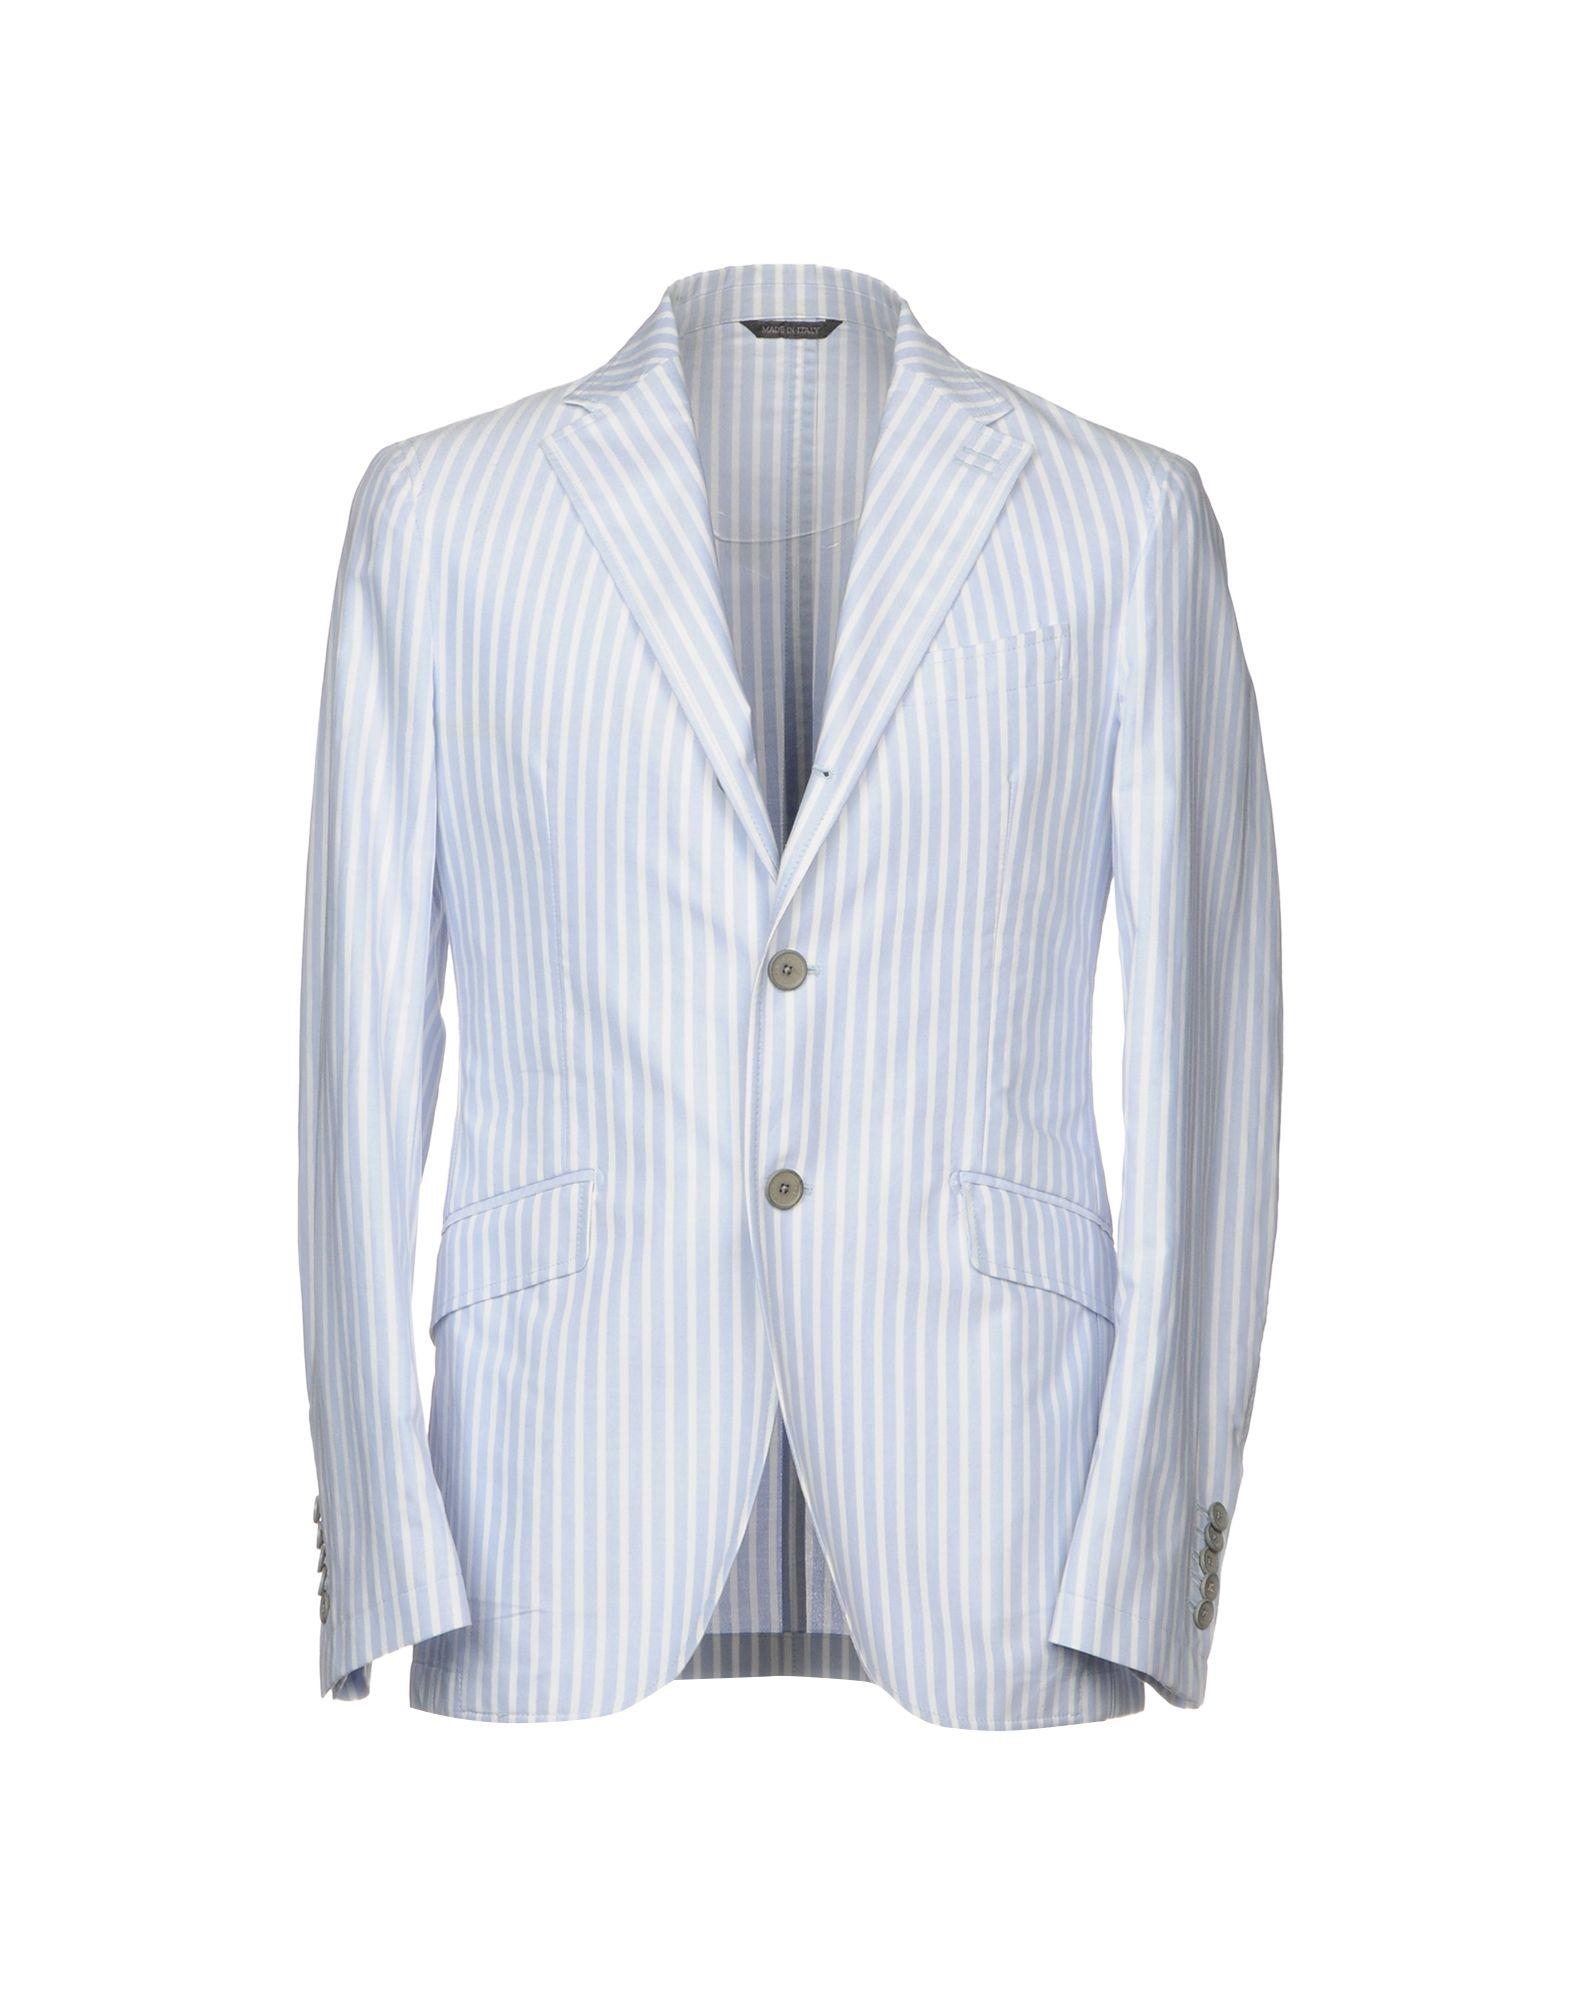 CARLO PIGNATELLI OUTSIDE Пиджак carlo pignatelli рубашка с длинными рукавами